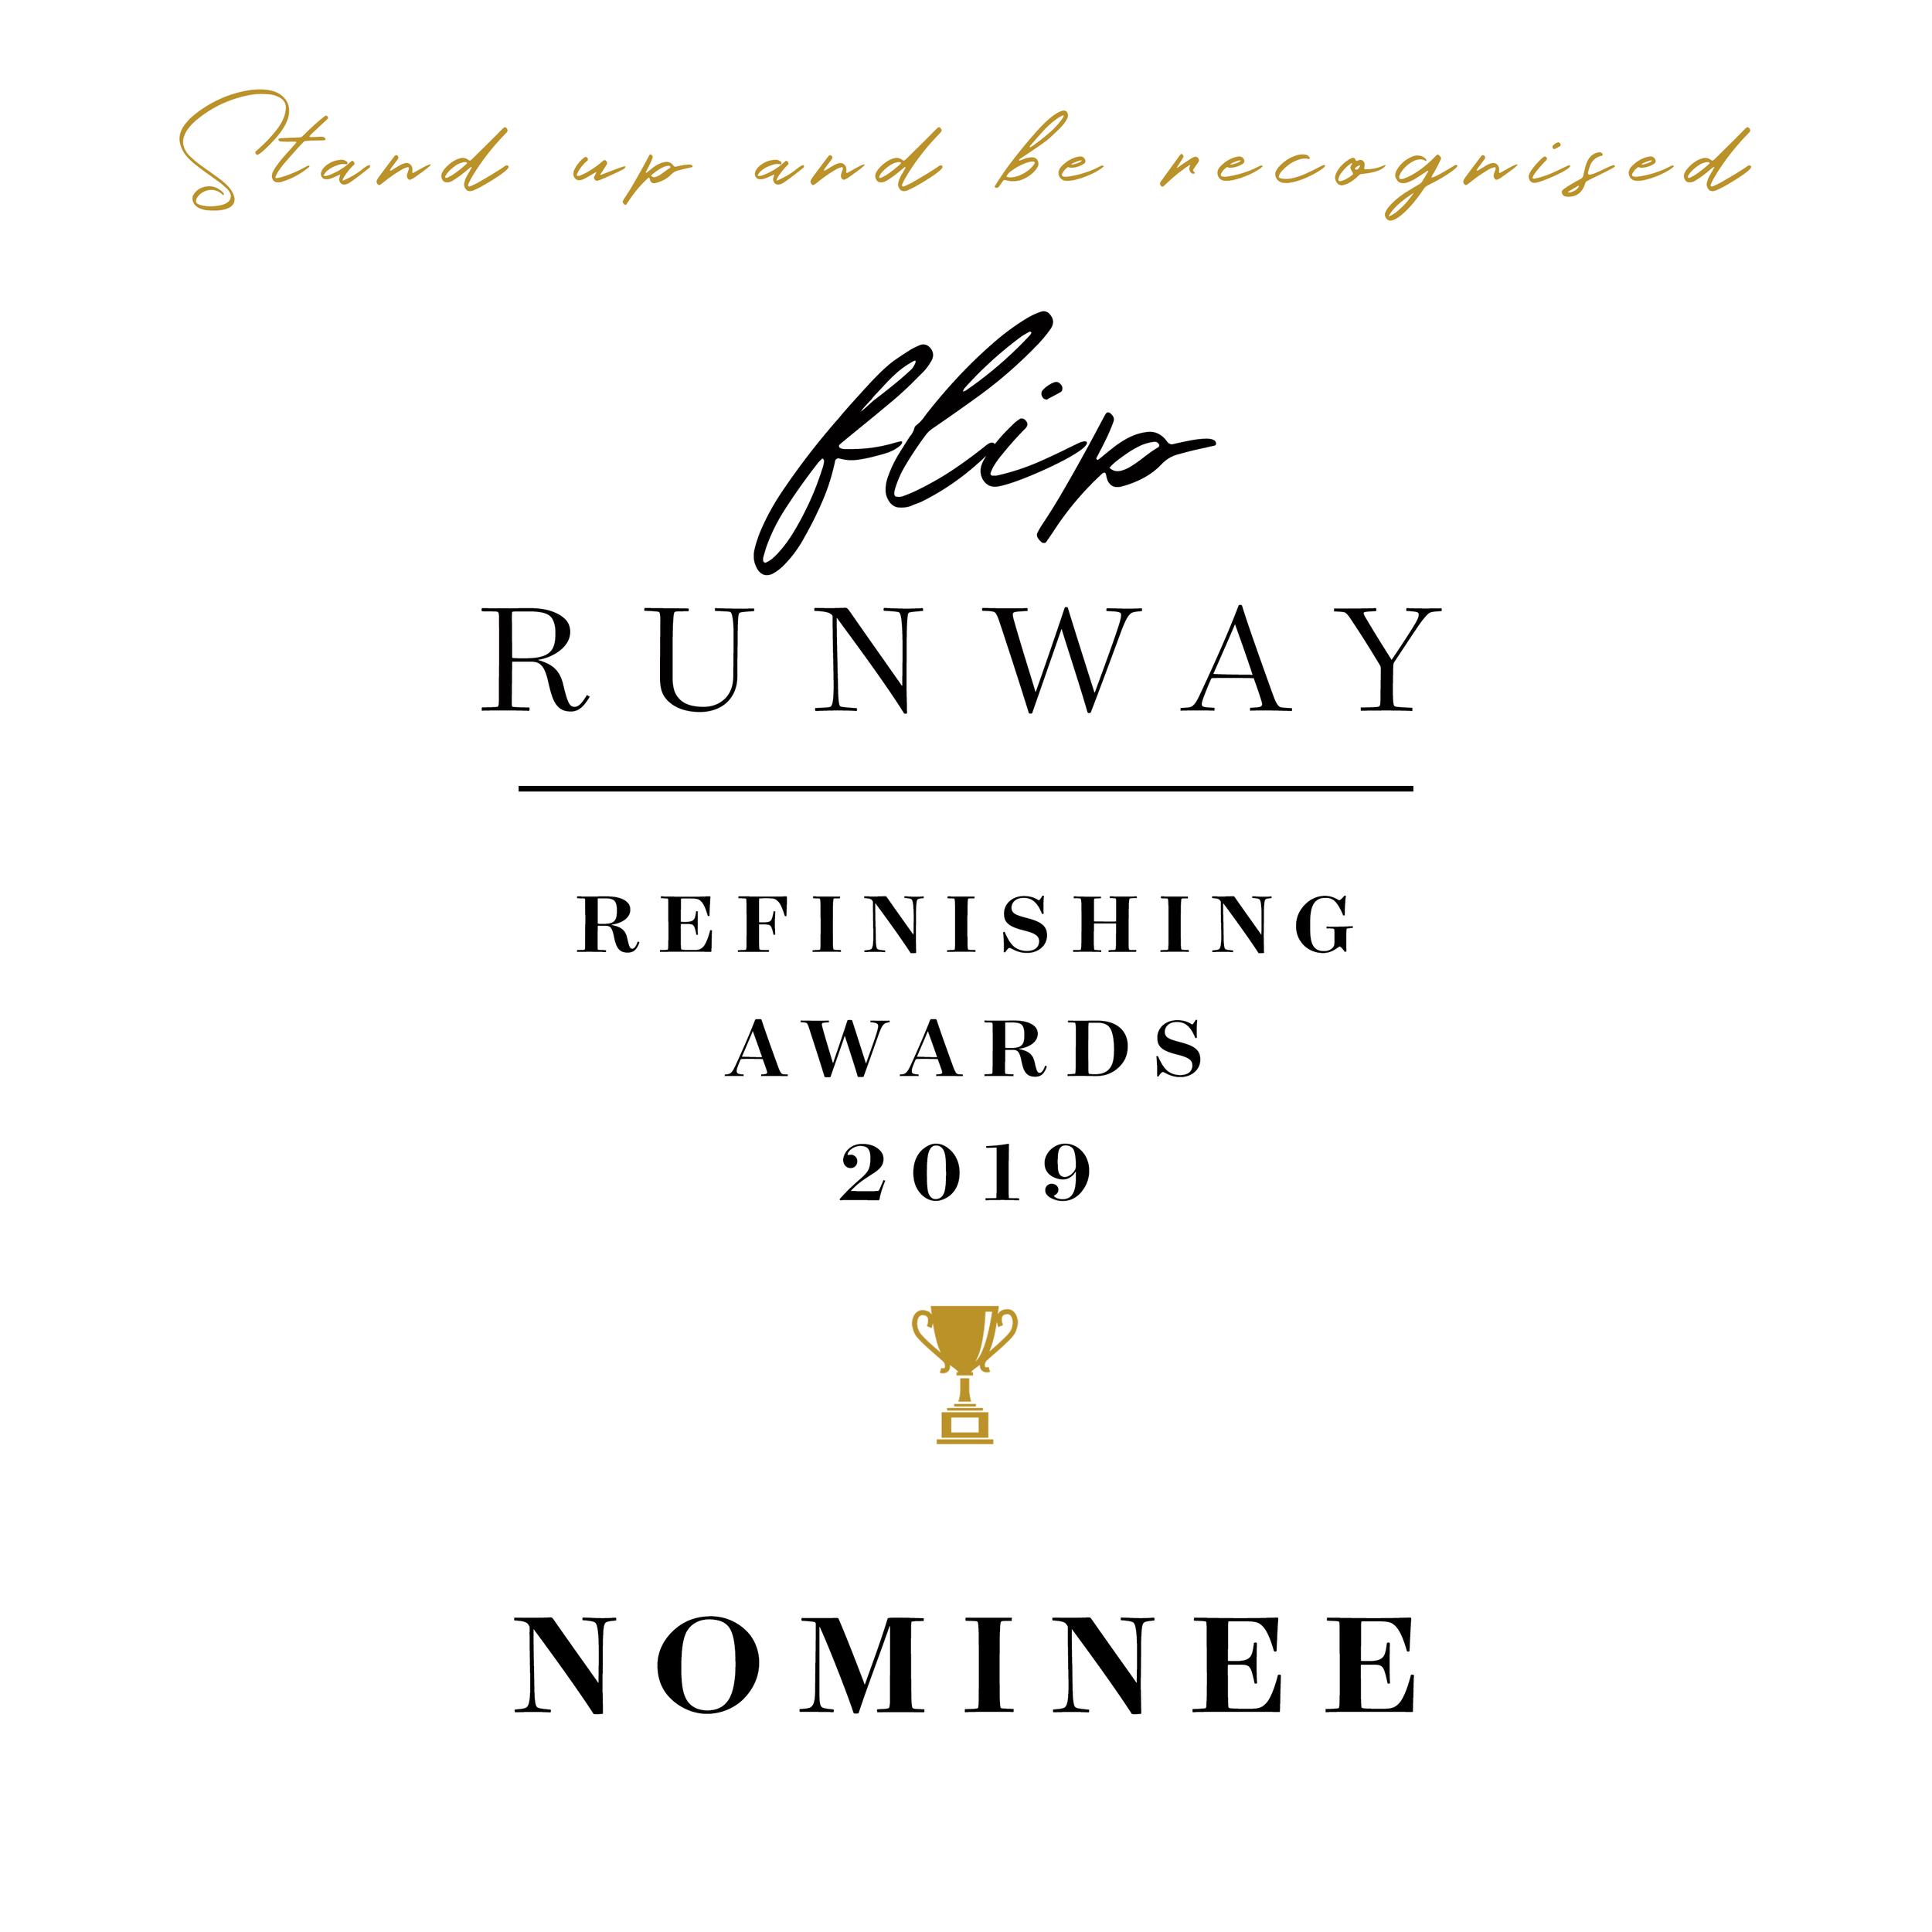 flip runway nominee UPCYCLED CREATIVE